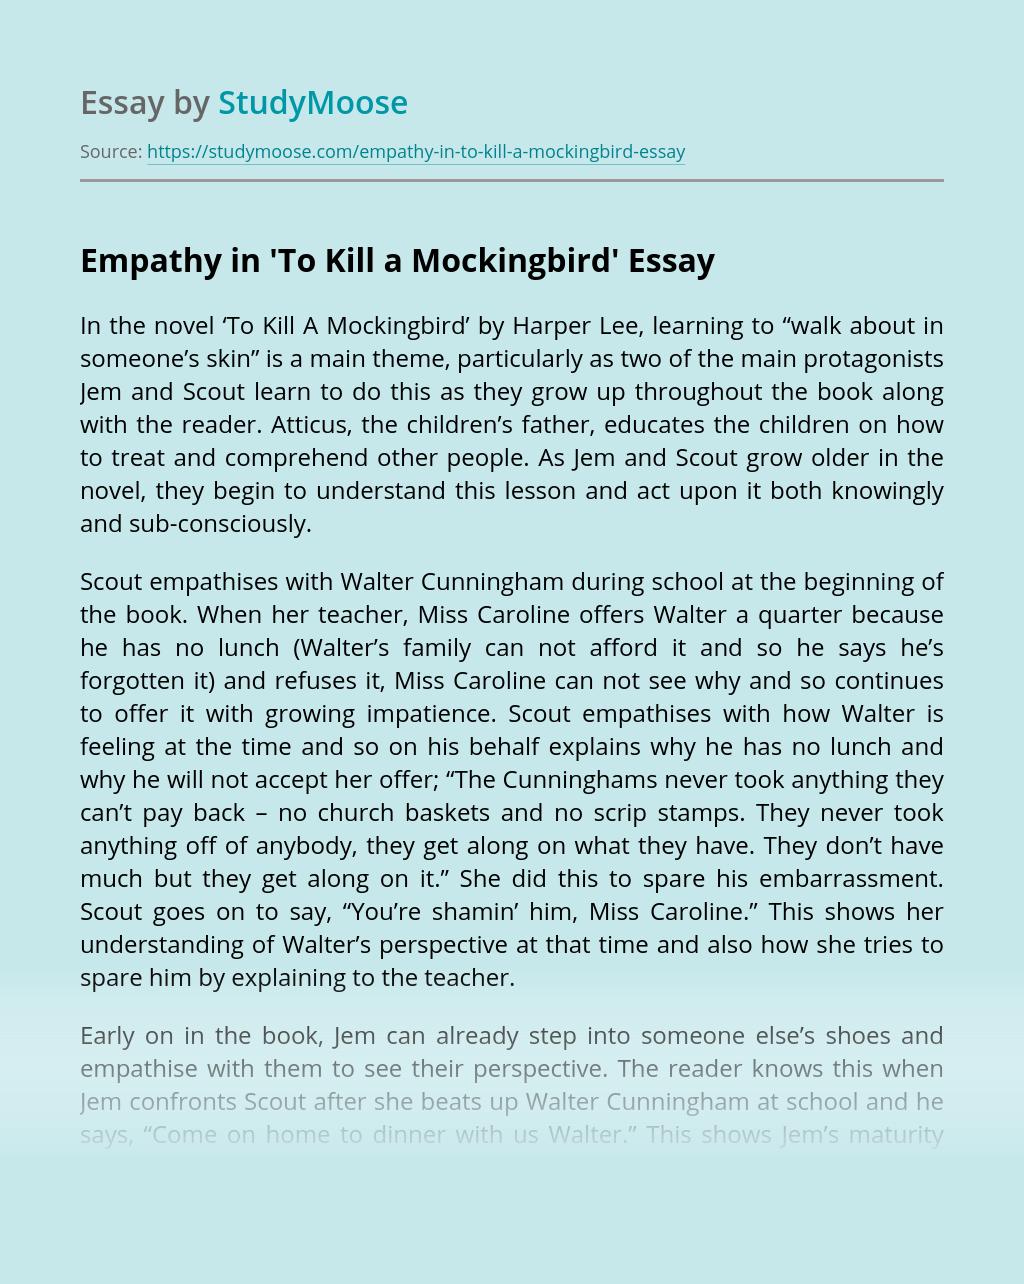 Empathy in 'To Kill a Mockingbird'